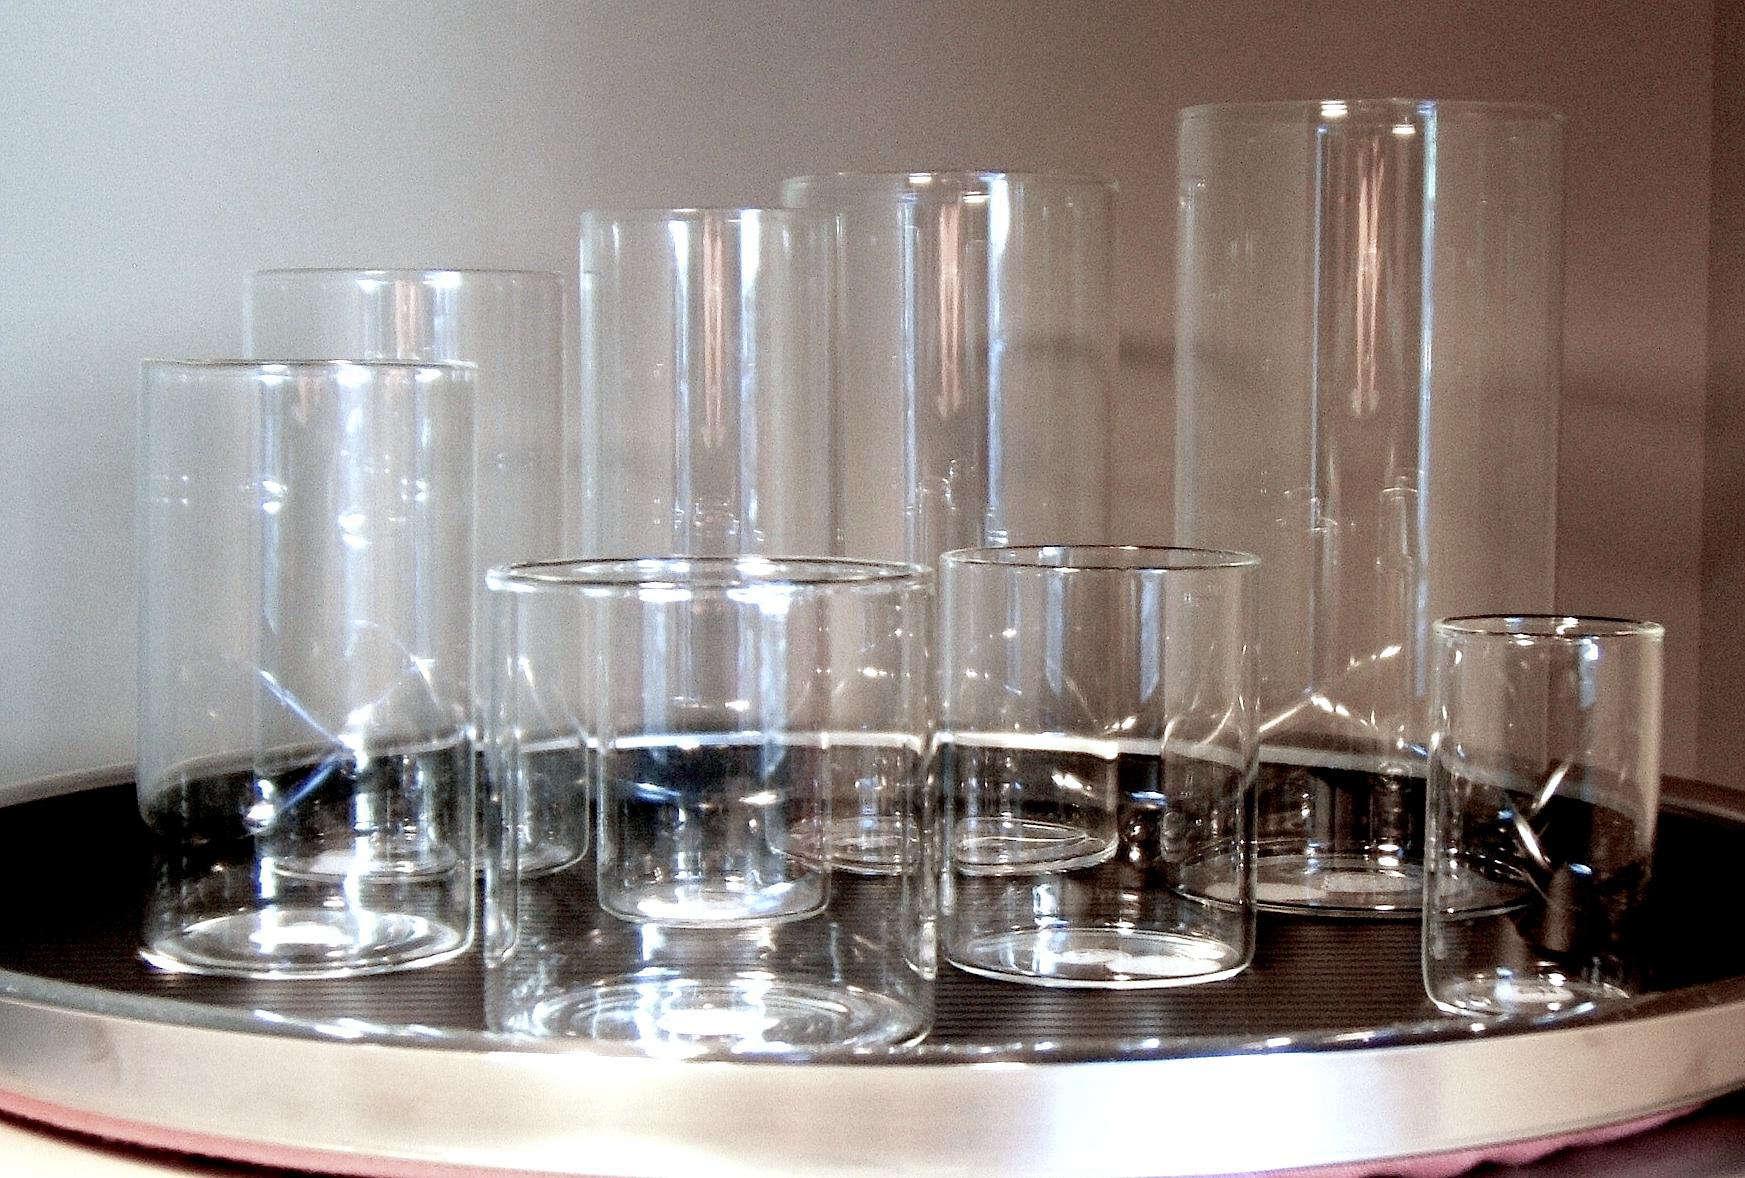 Orskiv Glasses Tray Close up